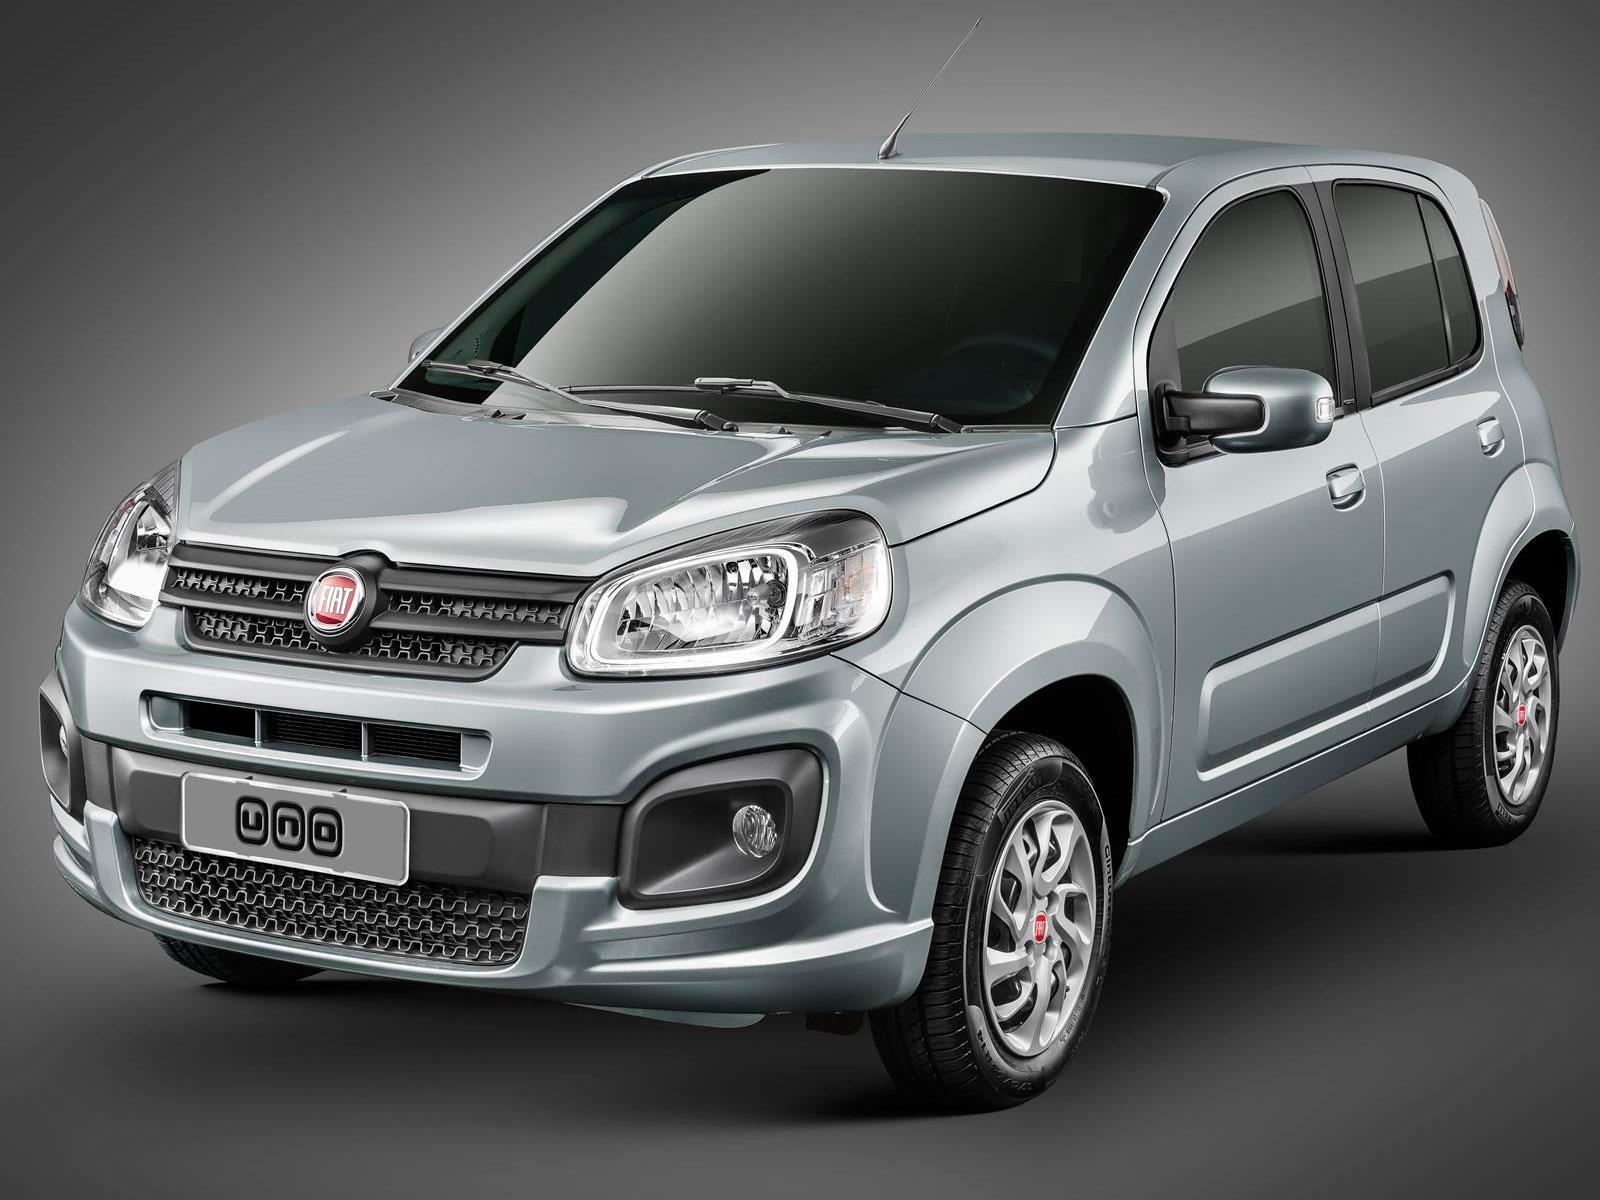 FIAT Uno 2017 llega a México desde $170,700 pesos ...